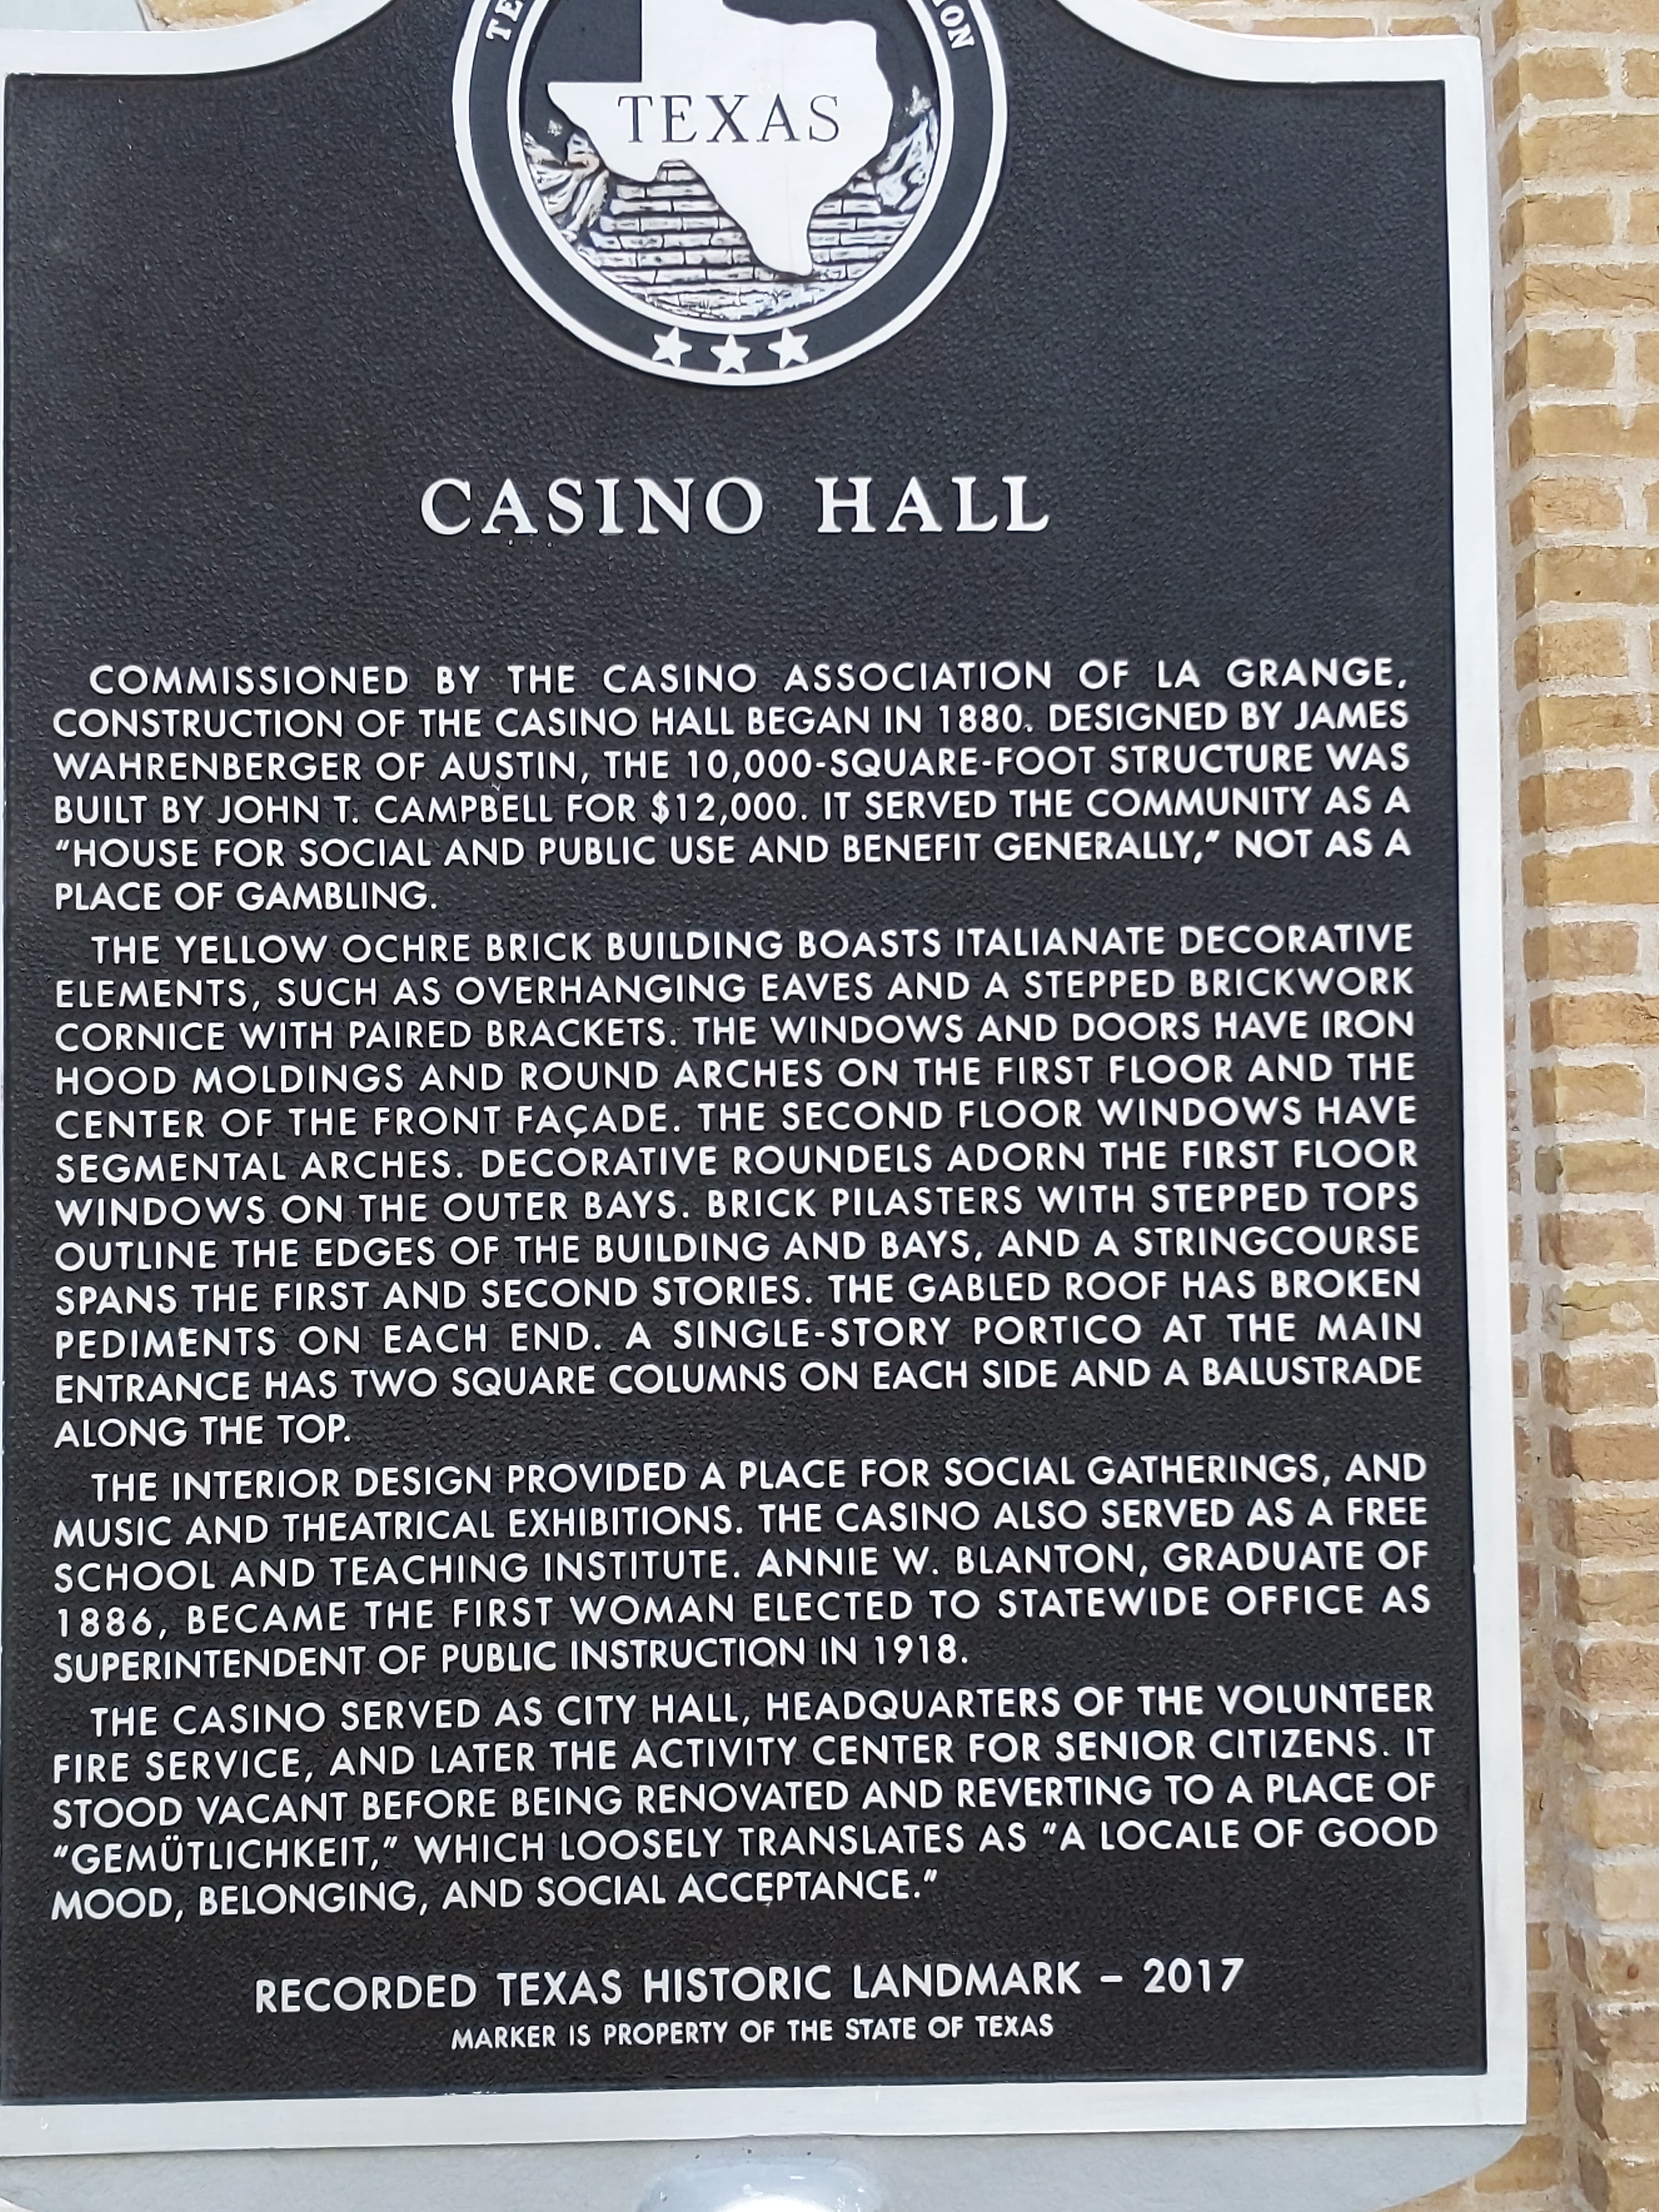 Historic marker for the Historic Casino Hall